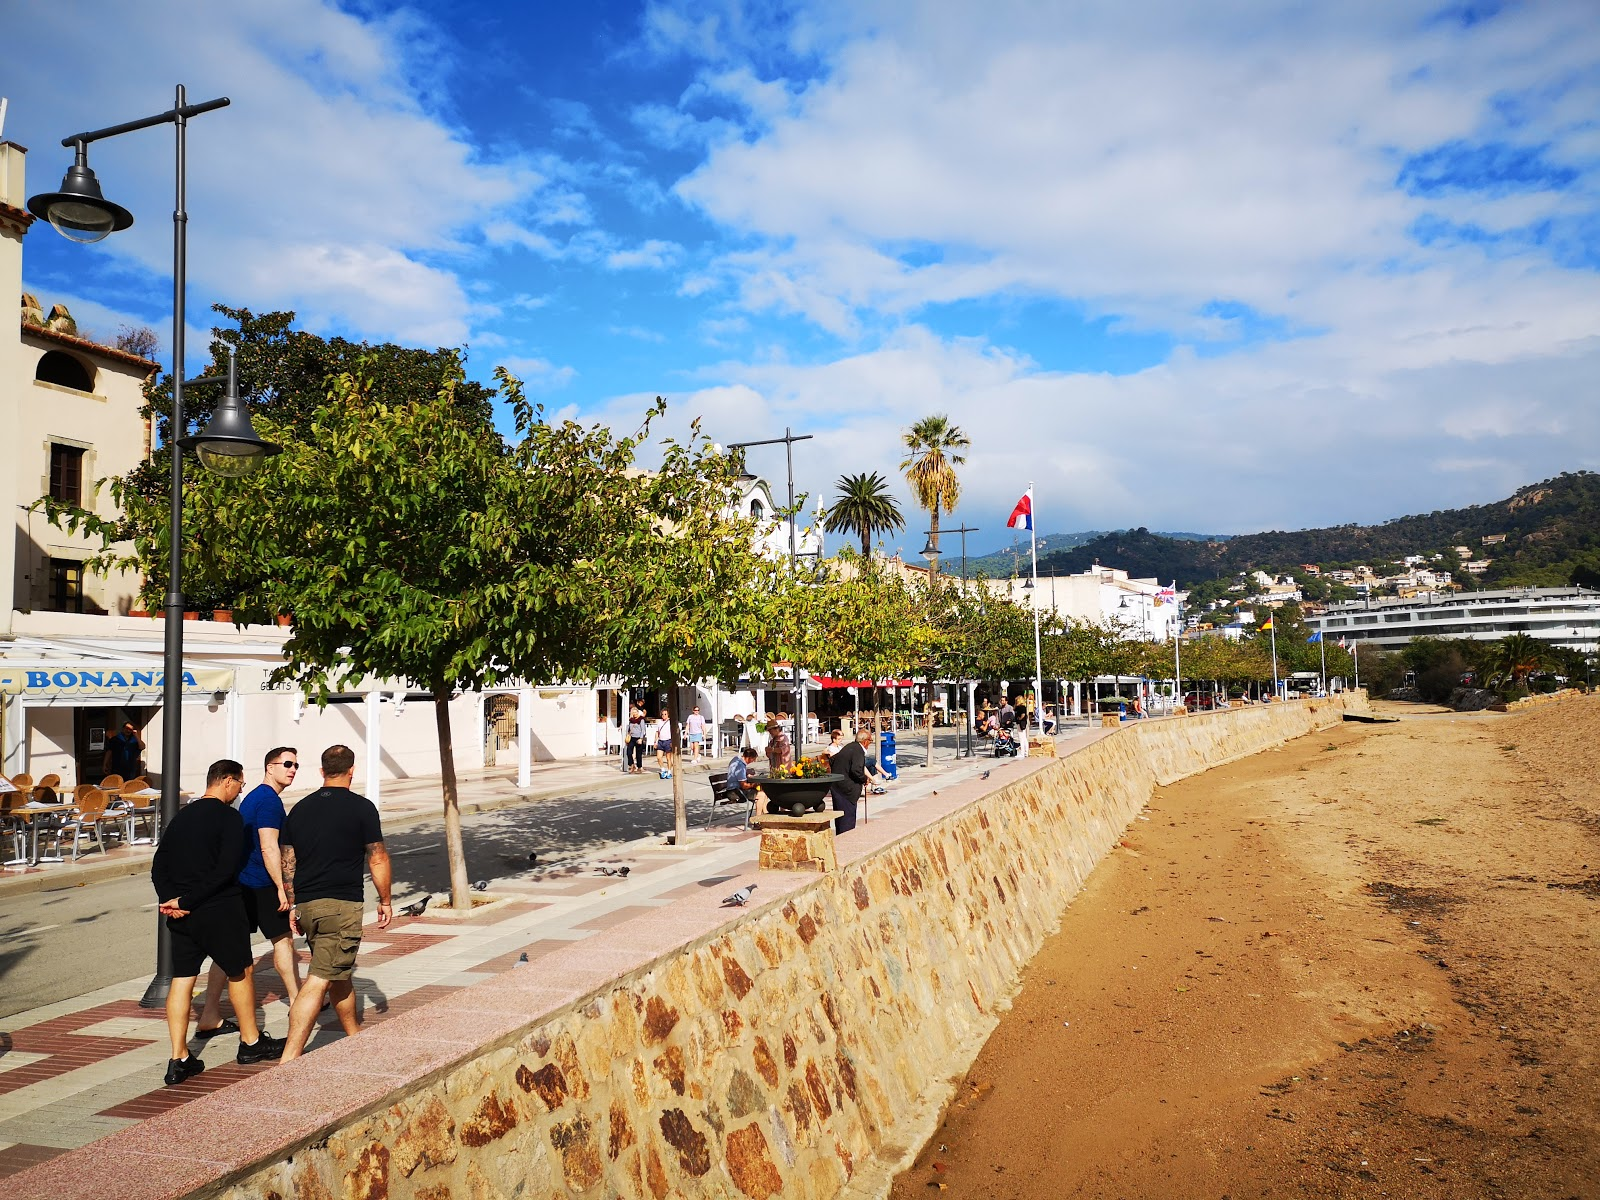 Андорра - Португалия (Лагуш) - Испания (Тосса-де-Мар, Жирона). Часть 3